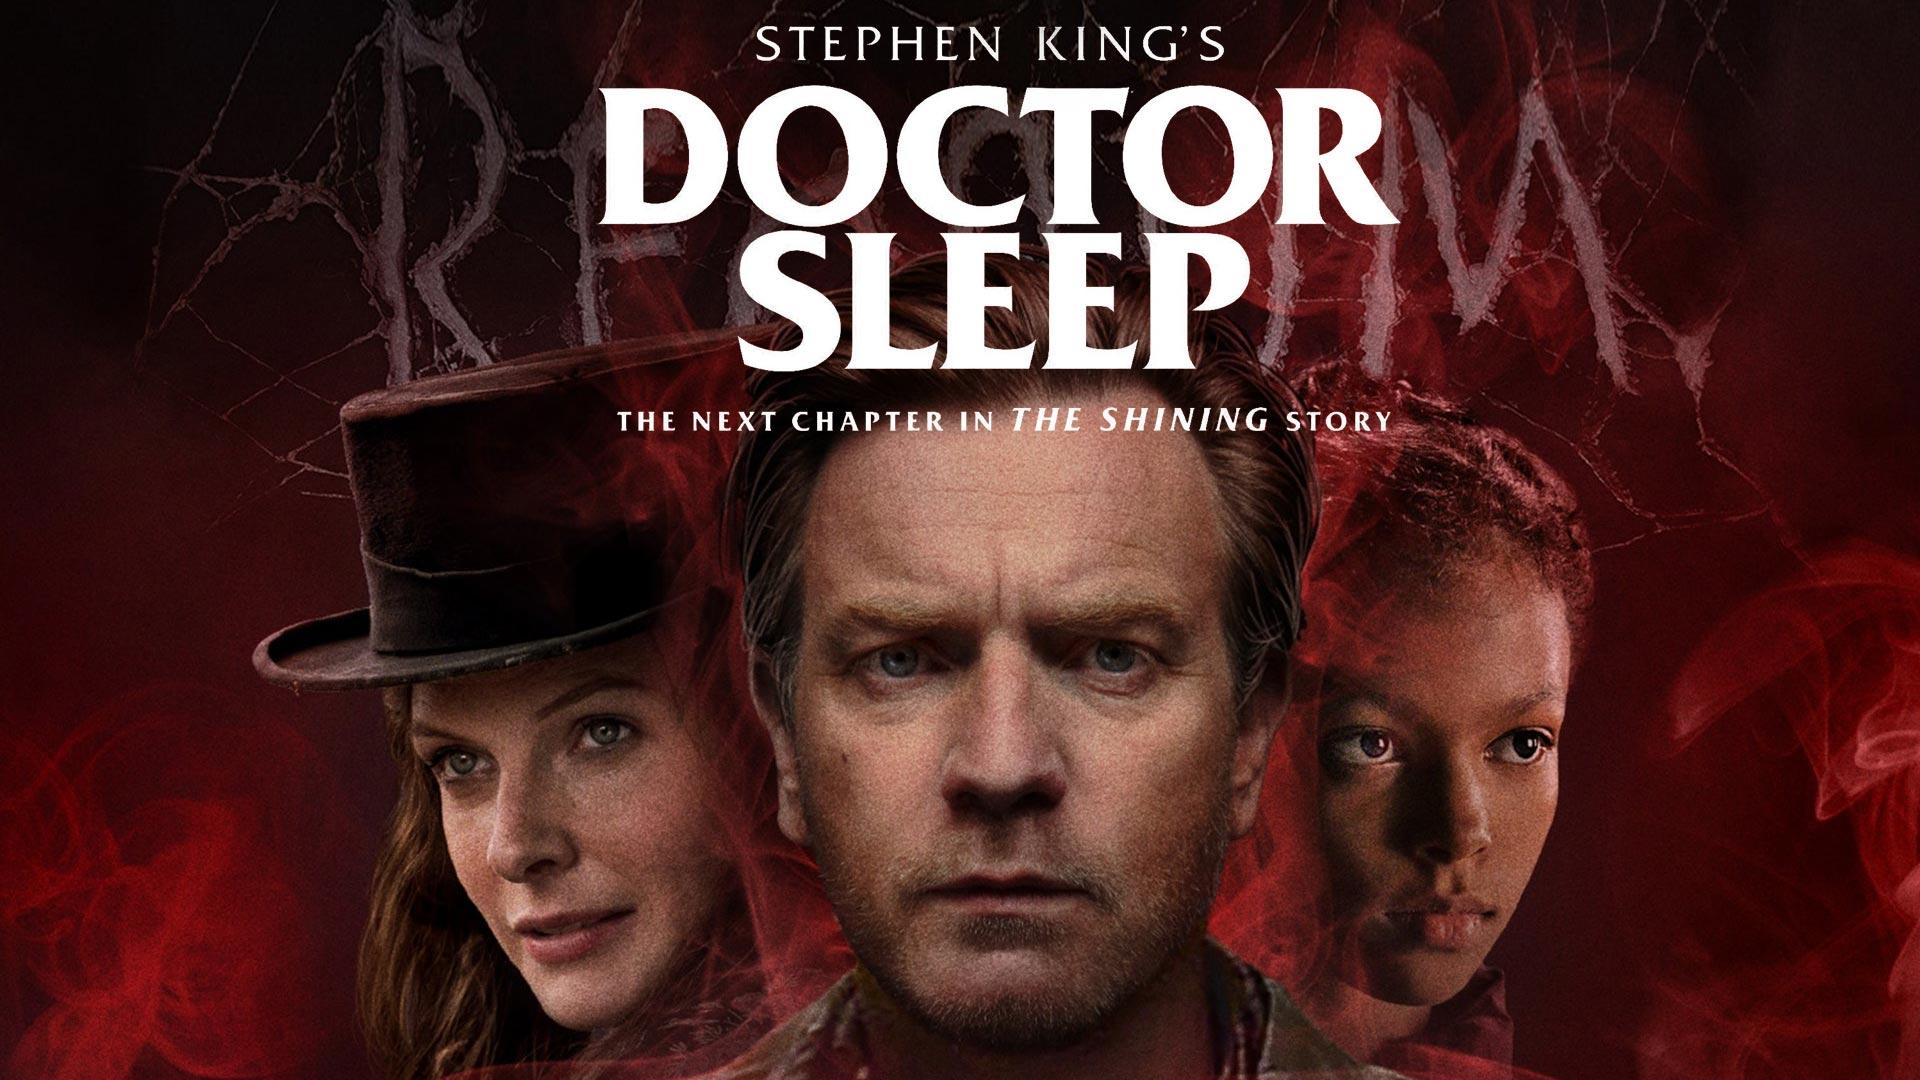 Doctor Sleep Director's Cut + Bonus Features